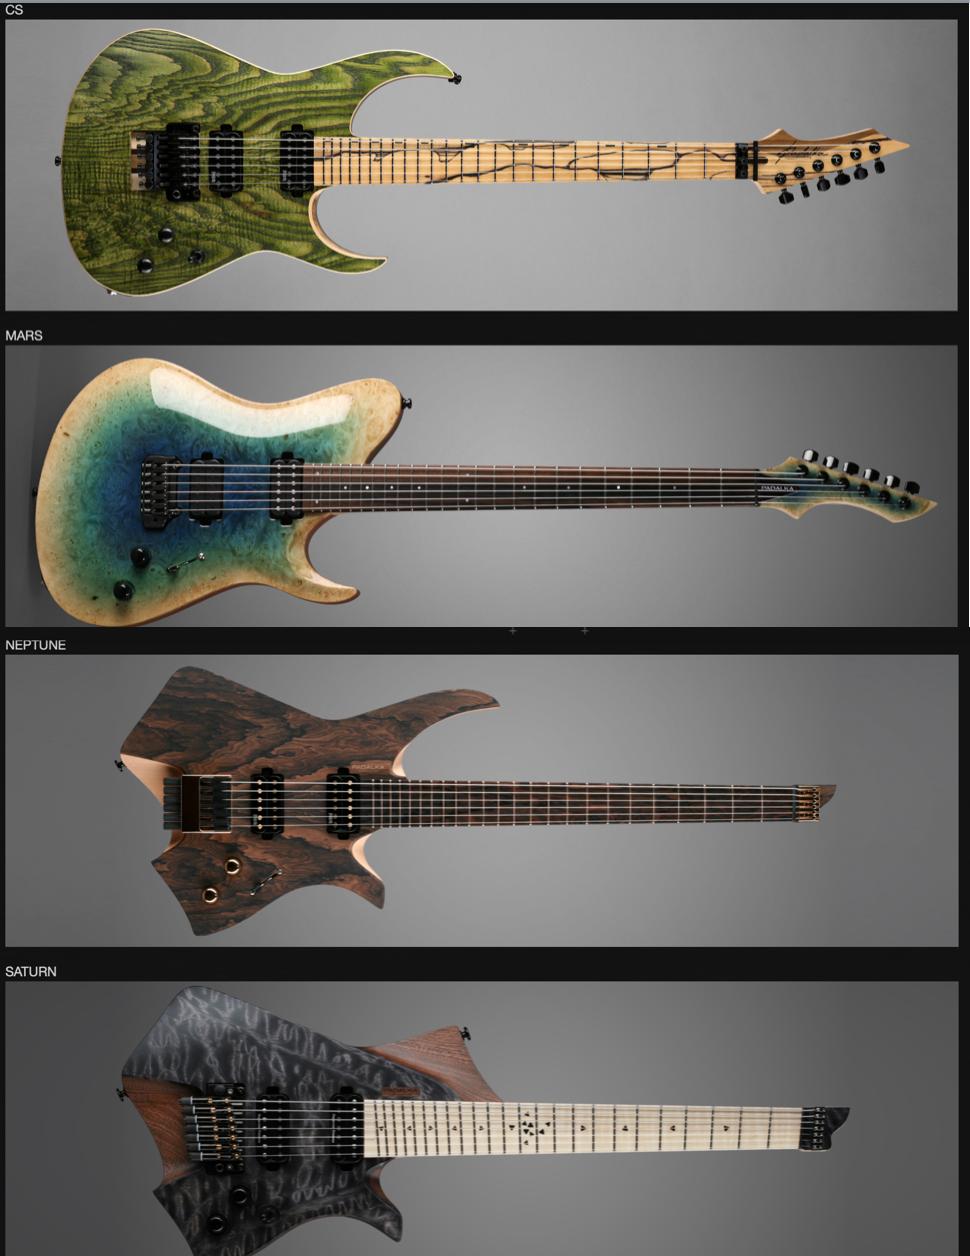 Algunos modelos Padalka (obtenido de http://padalka-guitars.com/guitars/)